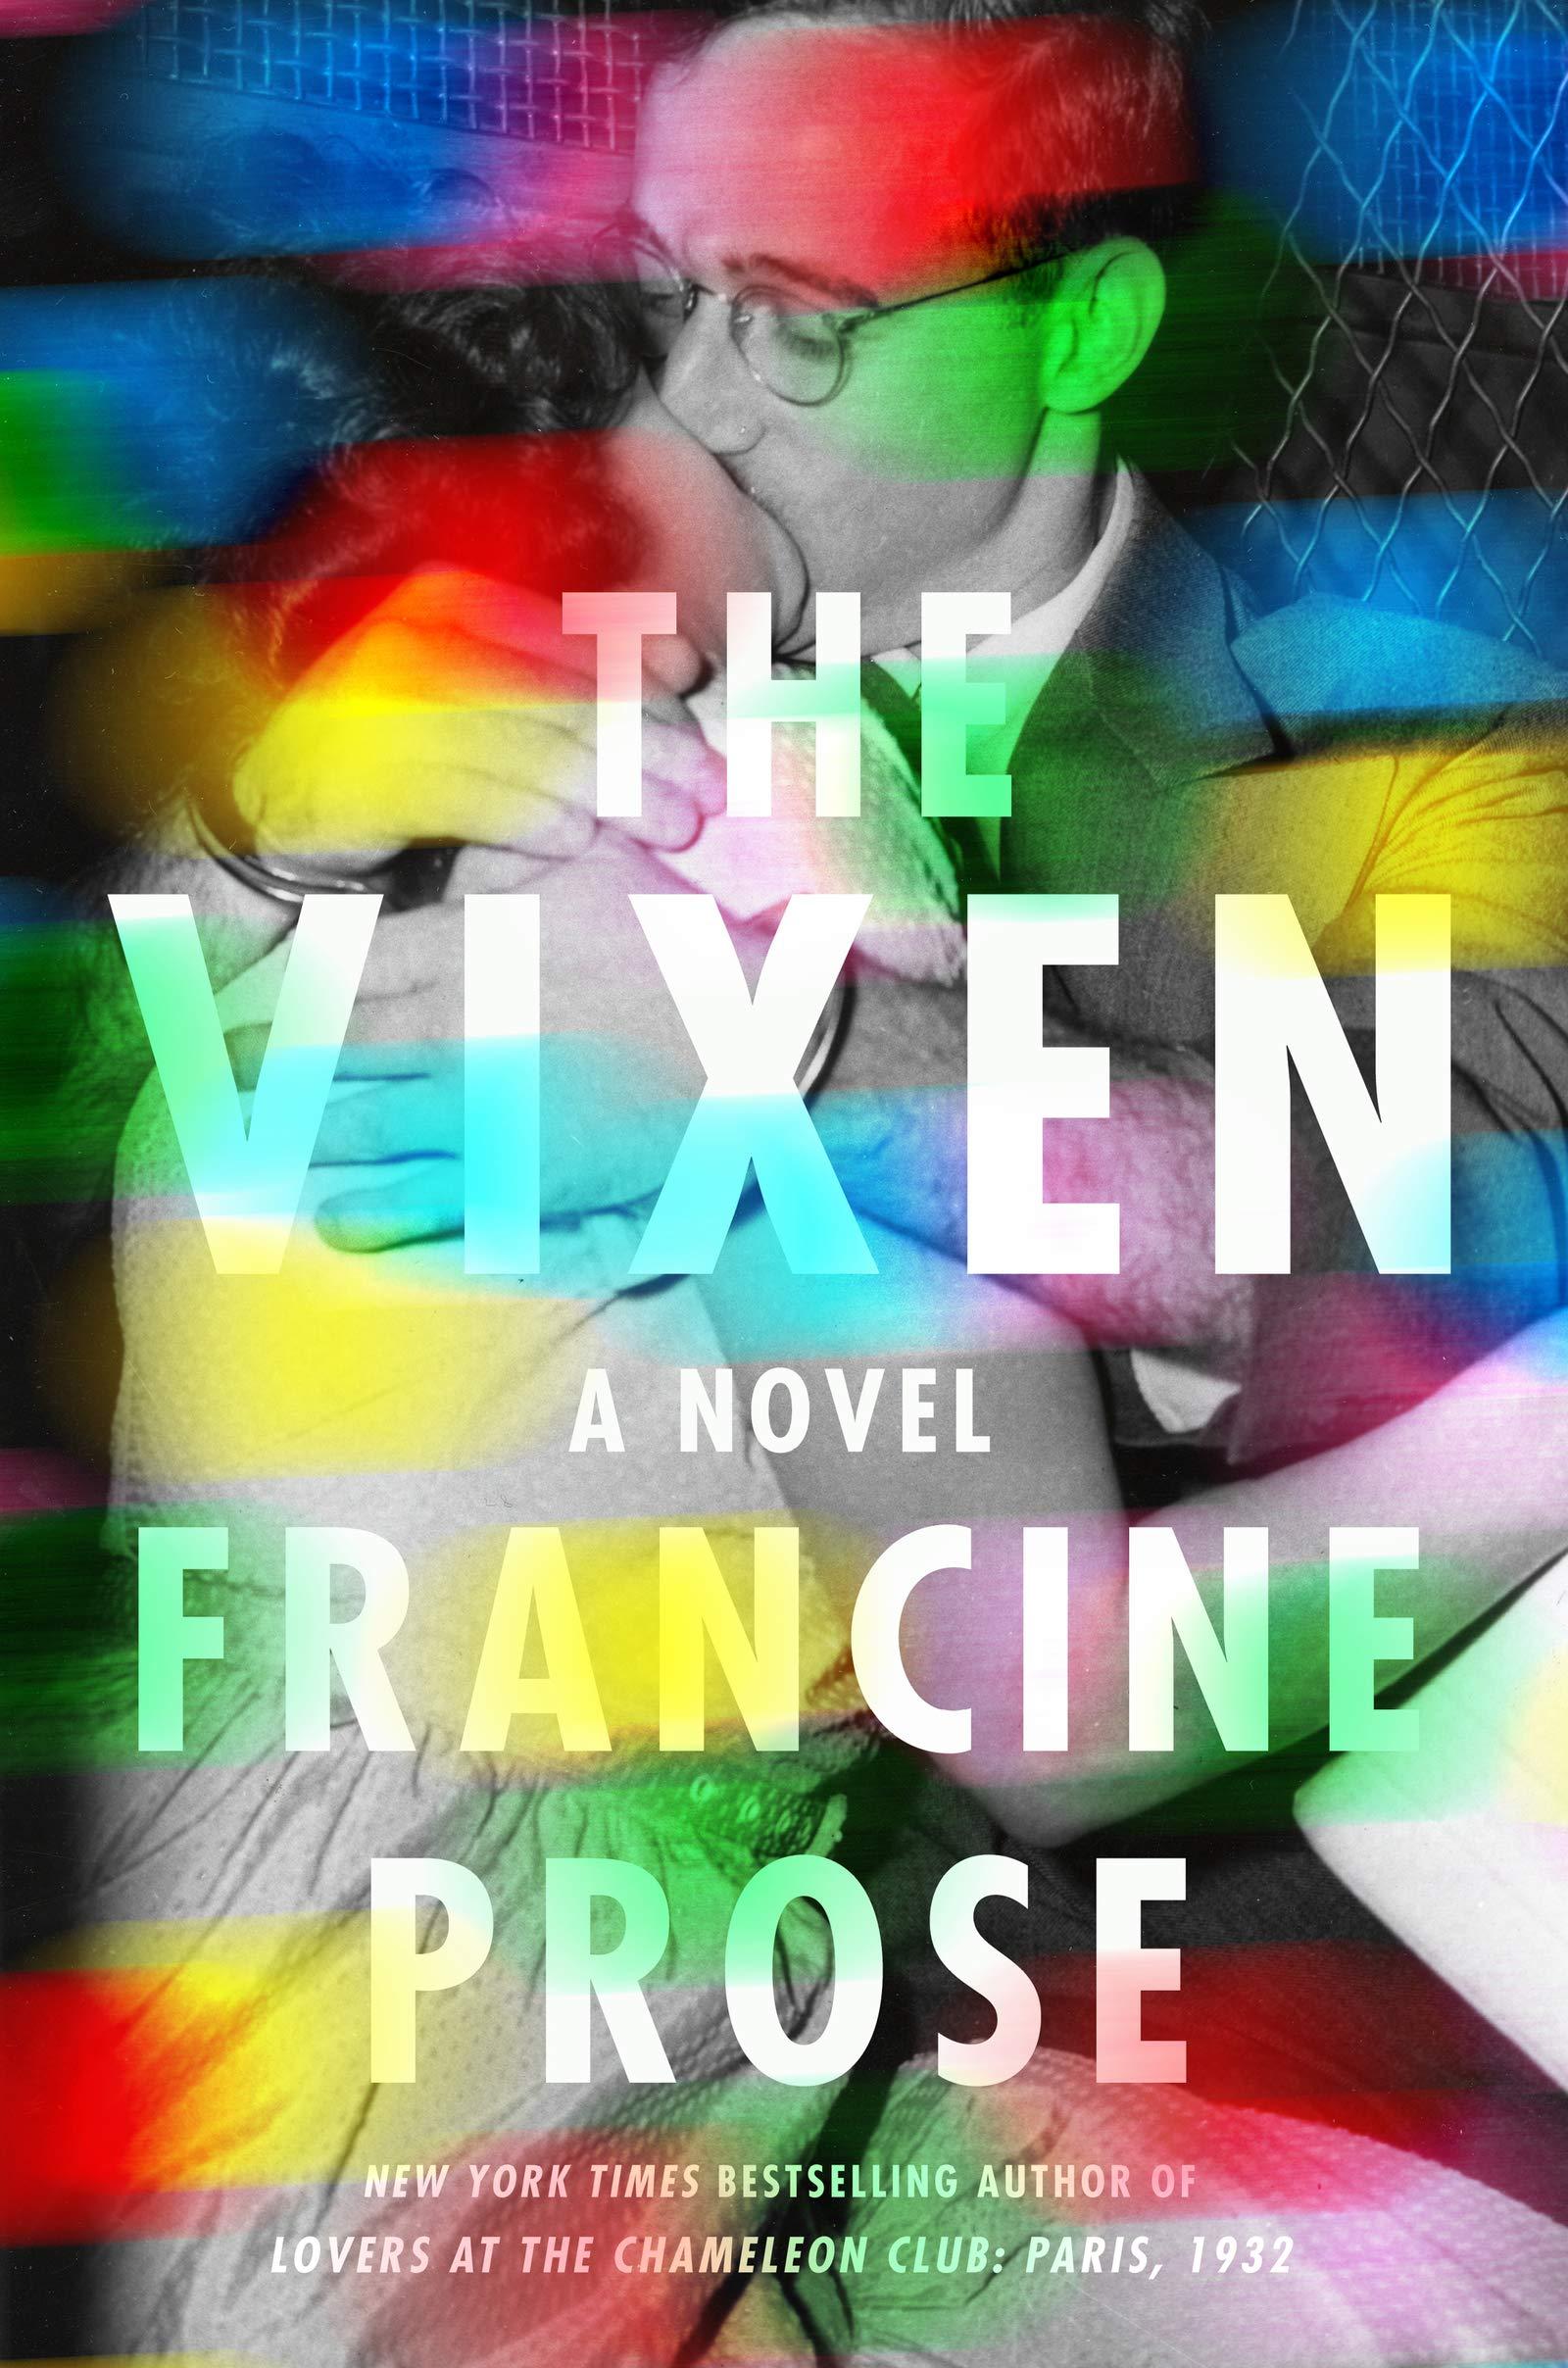 Amazon.com: The Vixen: A Novel: 9780063012141: Prose, Francine: Books